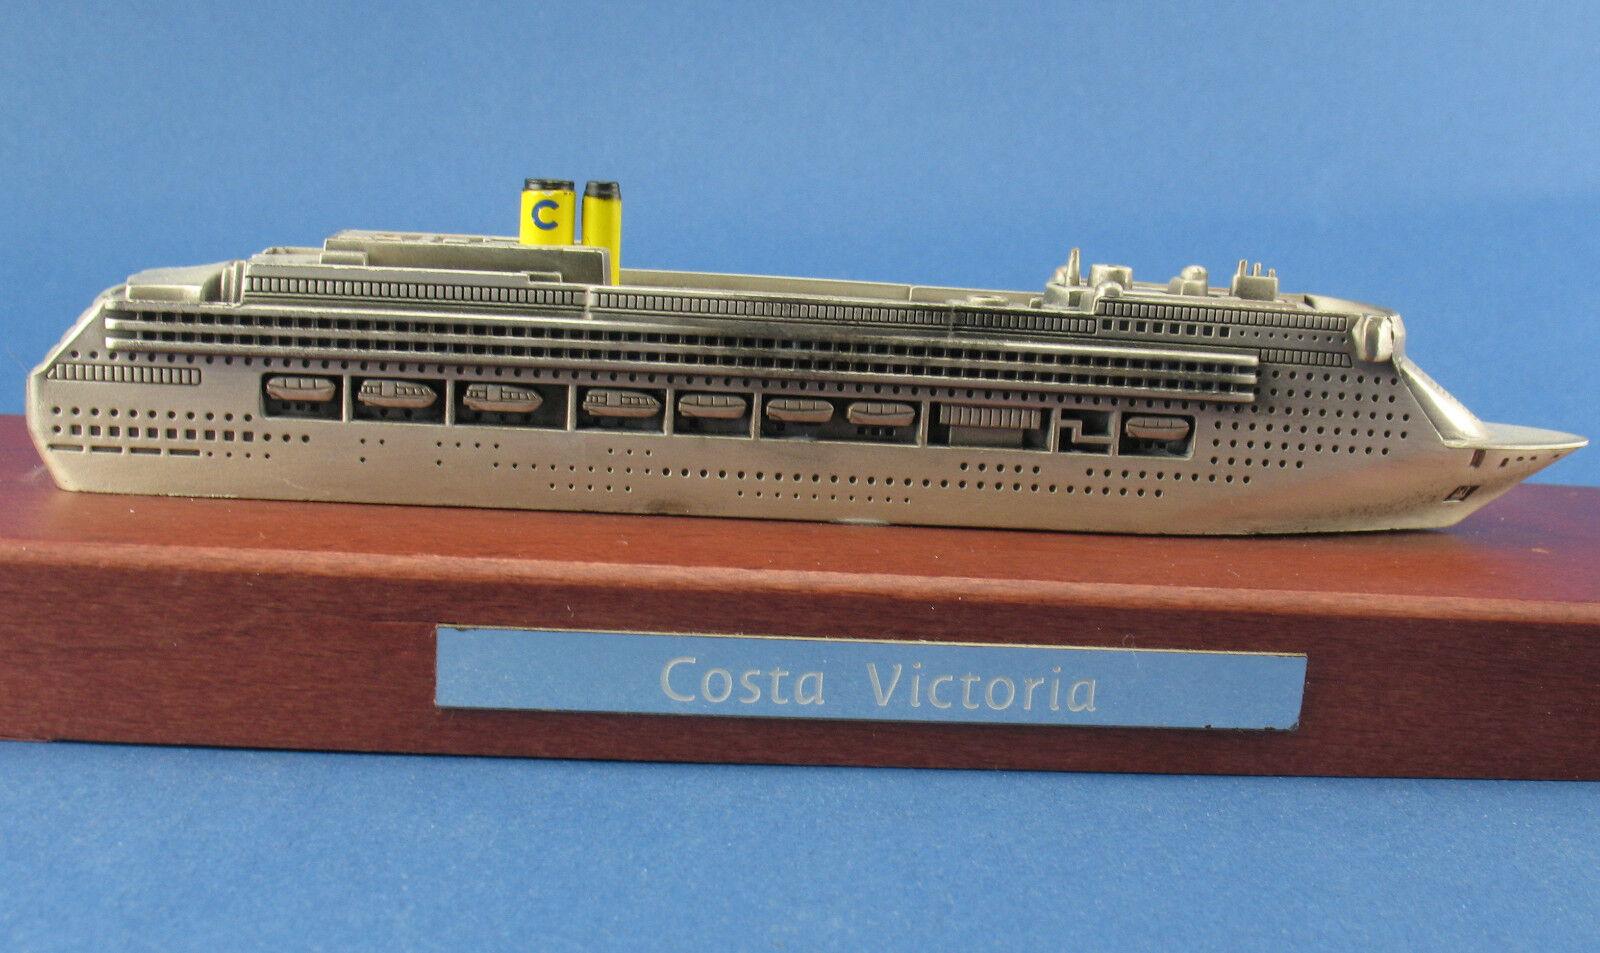 COSTA VICTORIA-Bateau de croisière-Cruise Ship - 17,9 cm Modèle Bateau-ideafp